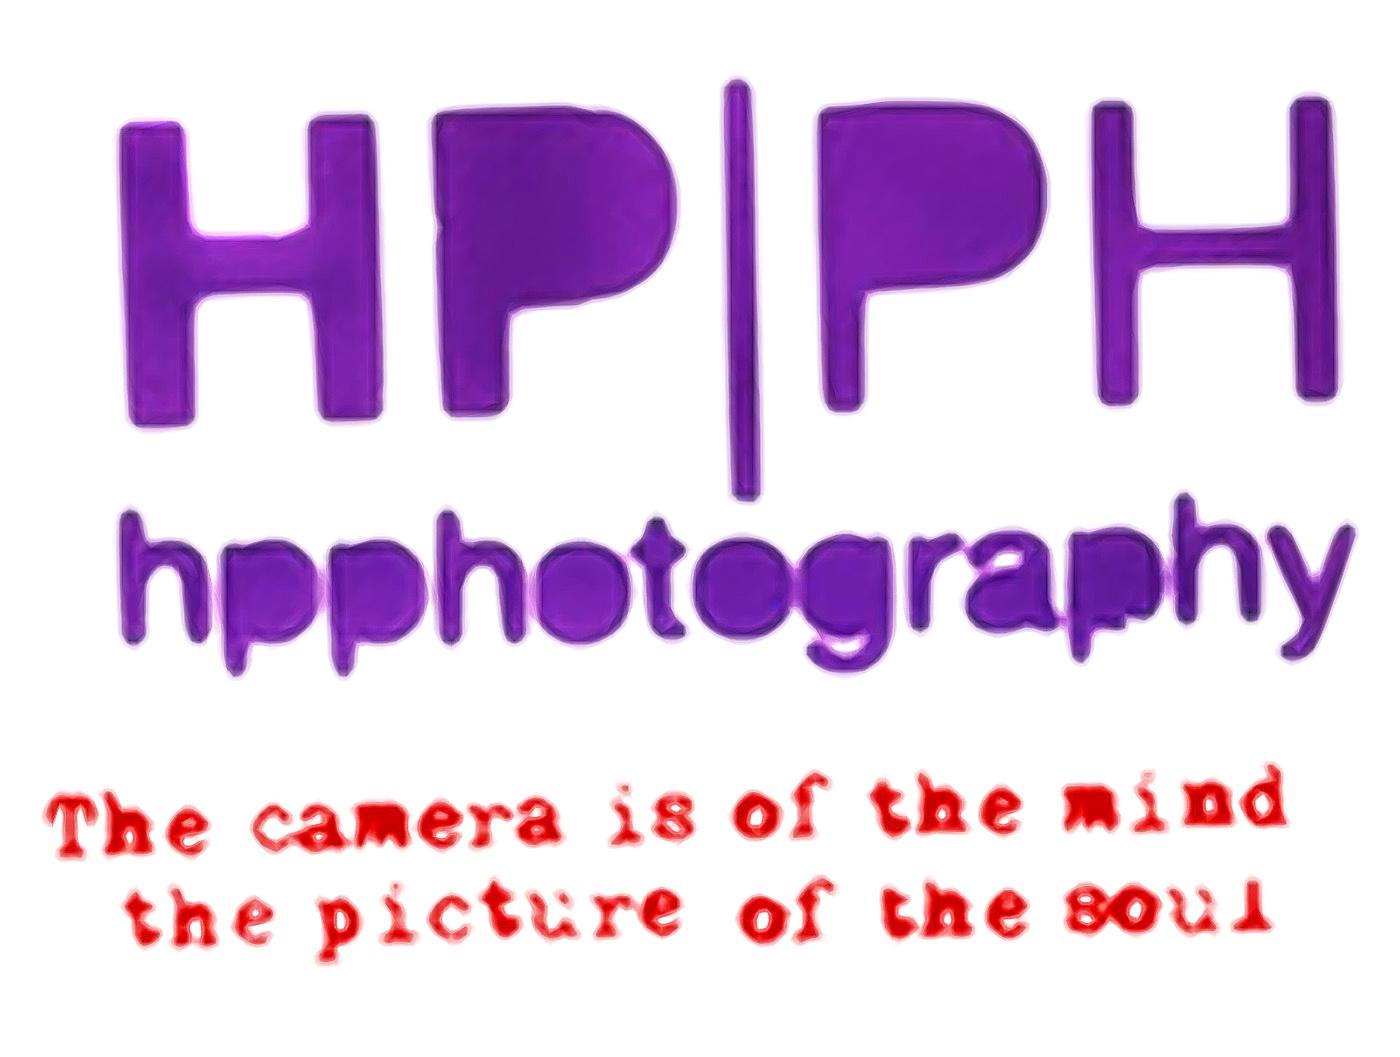 HPIPH